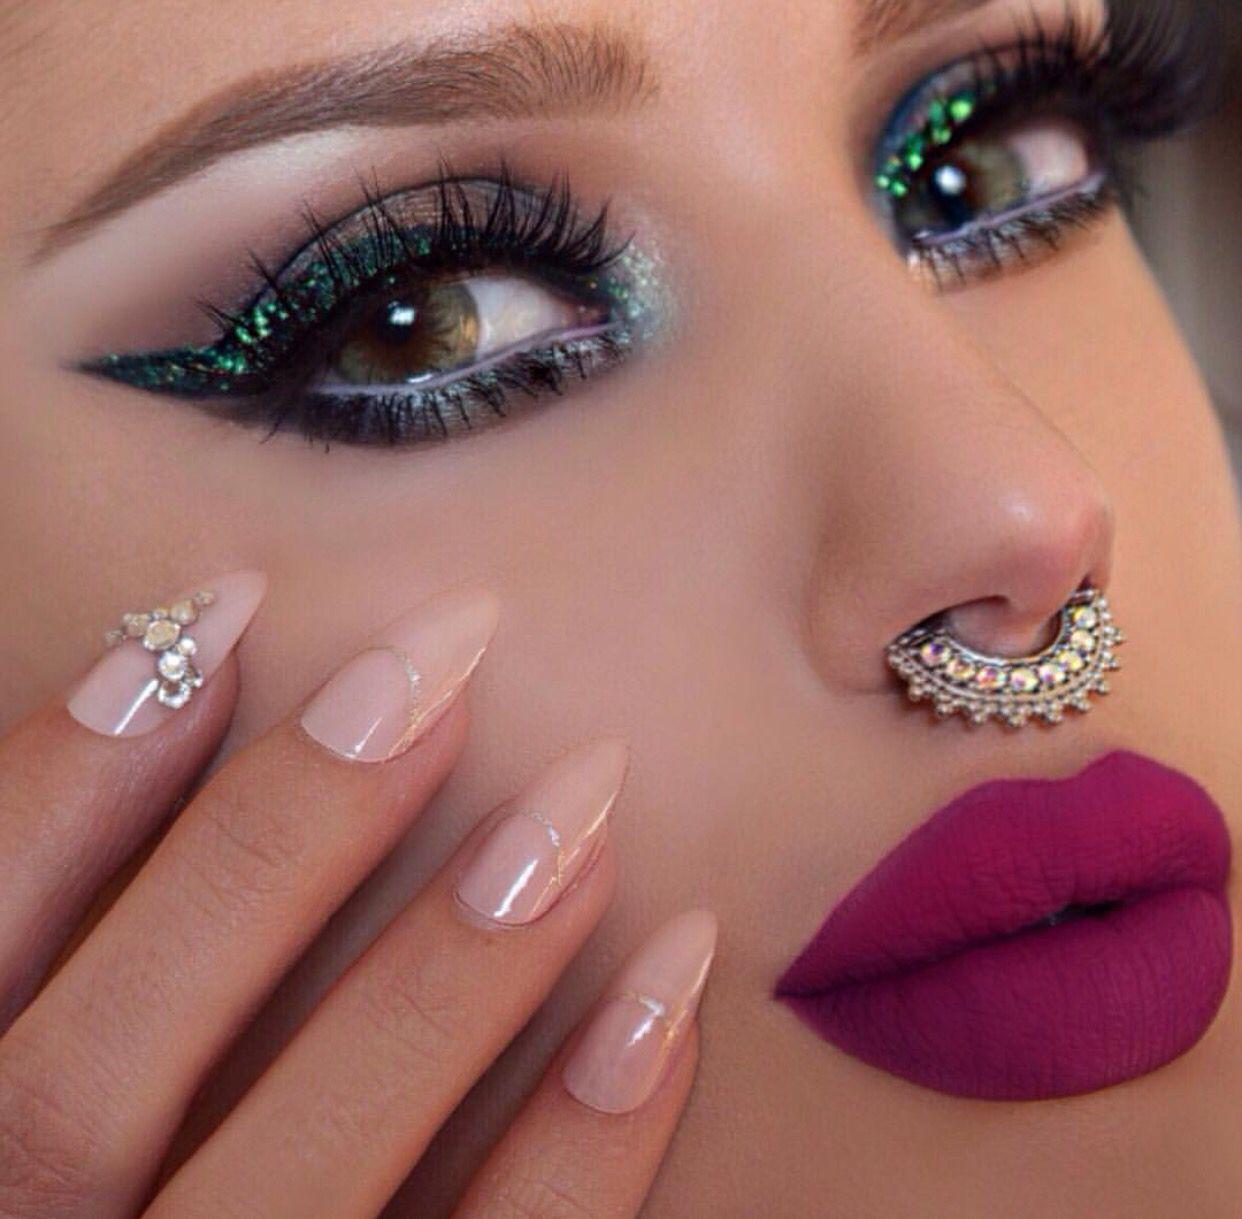 Make up Makeup geek cosmetics, Glitter eyeliner, Makeup